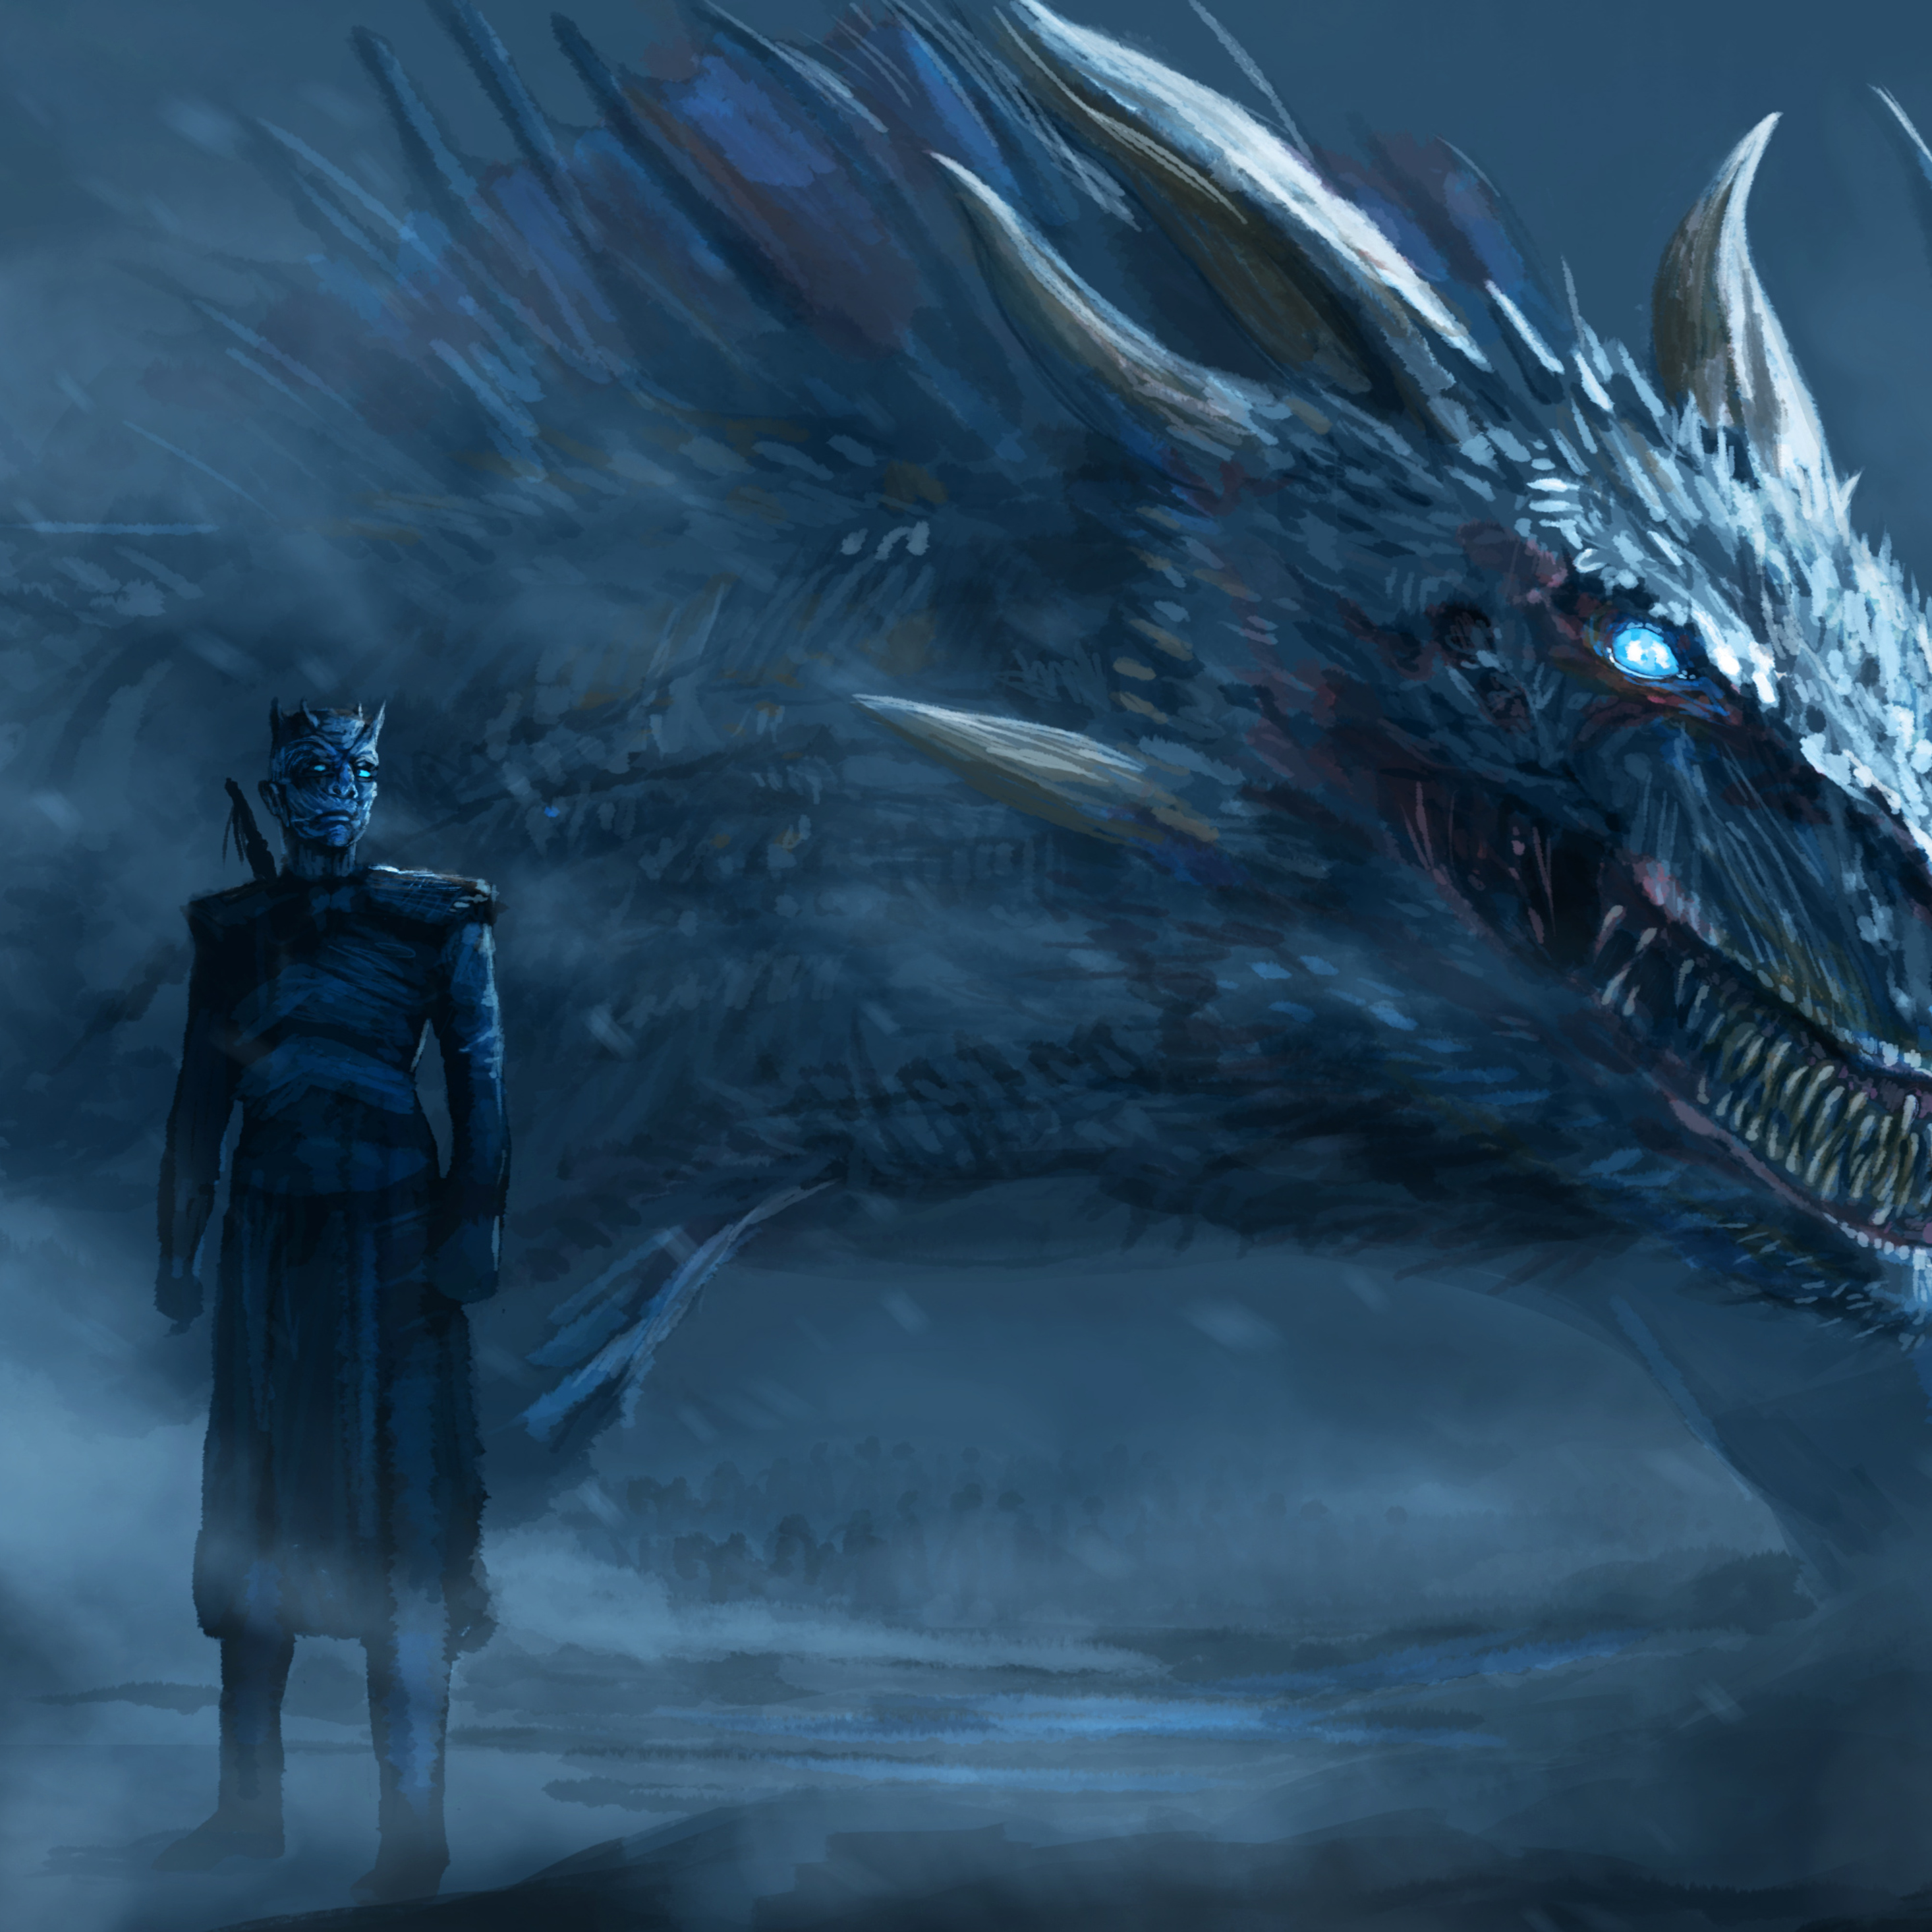 white-dragon-of-night-king-qa.jpg